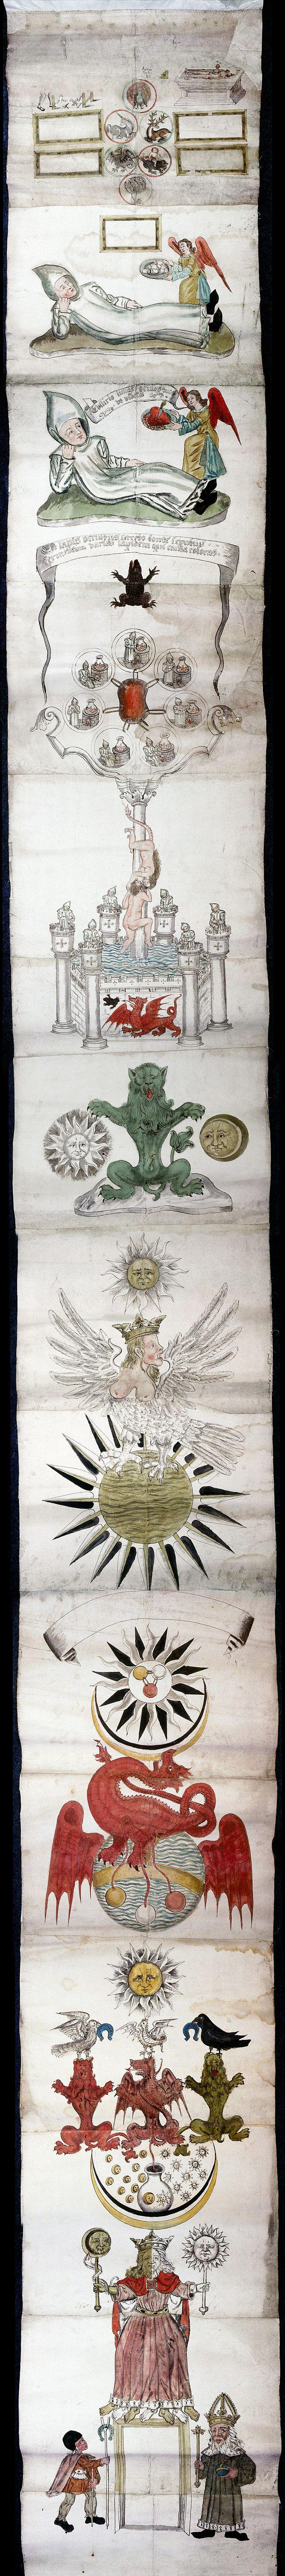 MS. Ash. Rolls 53, Bodleian Library